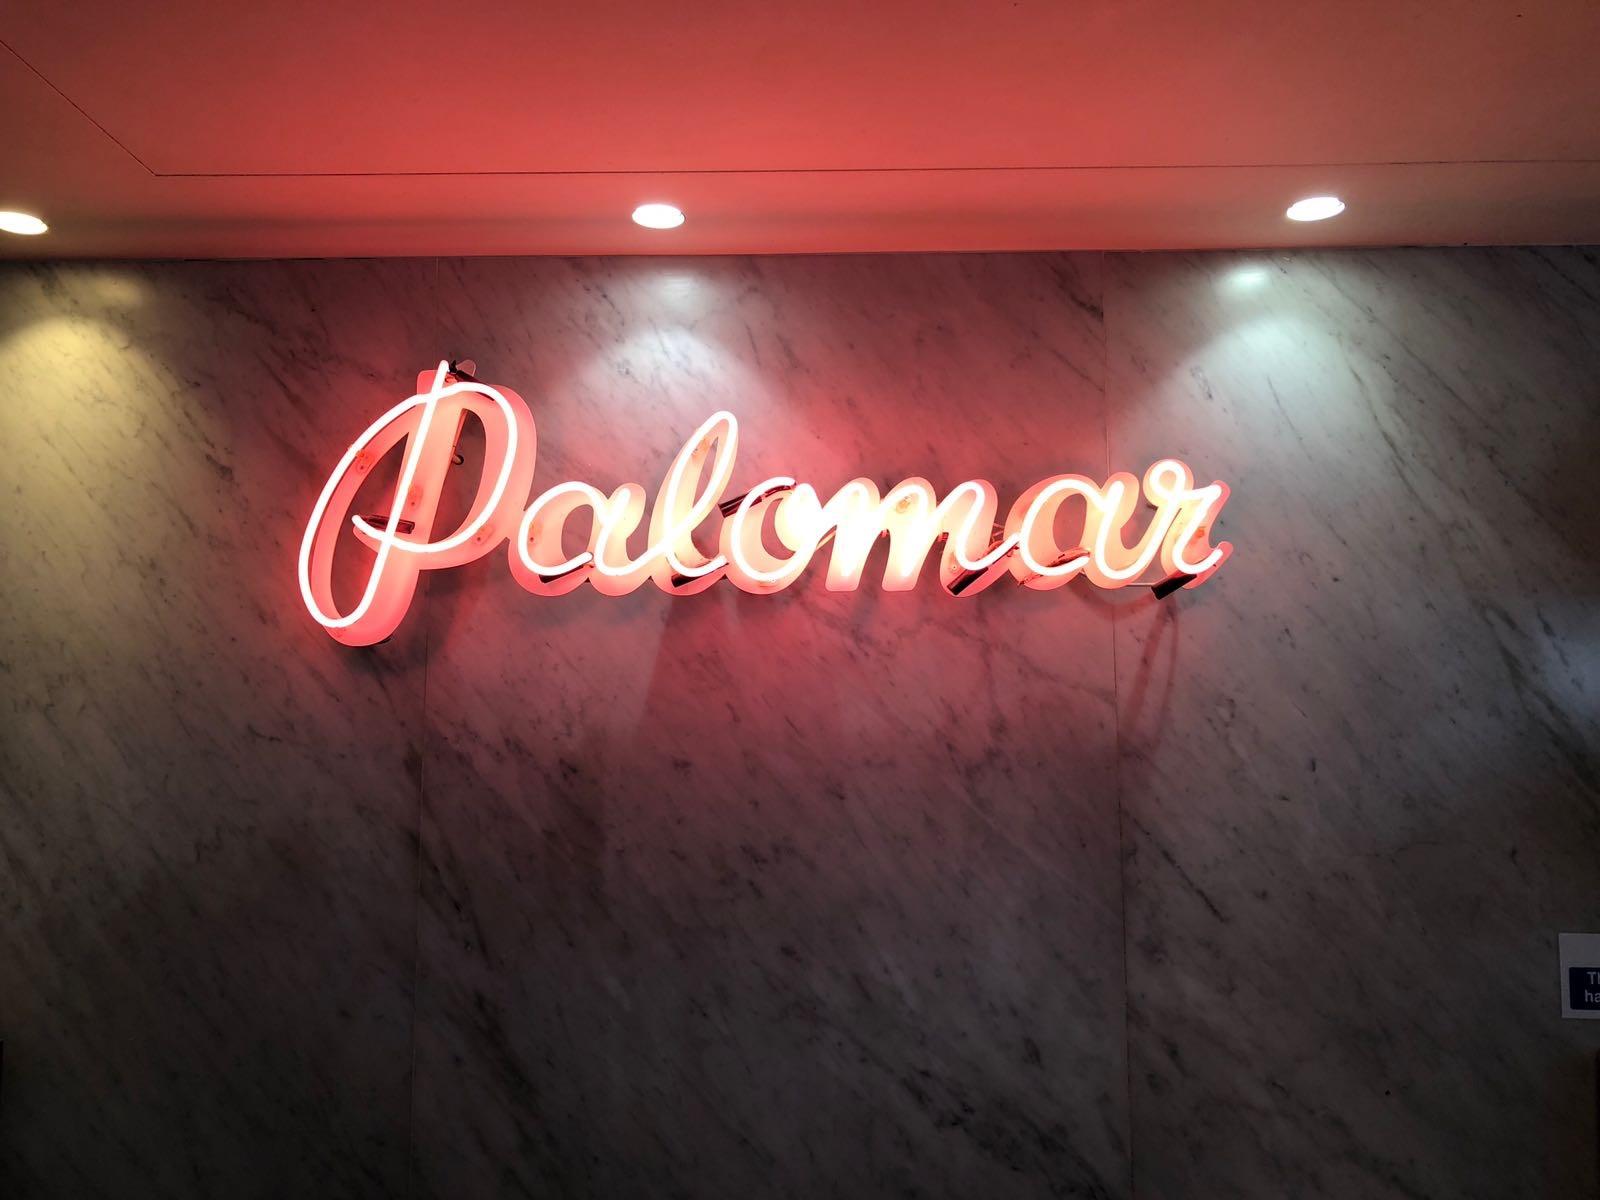 The Palomar Londen